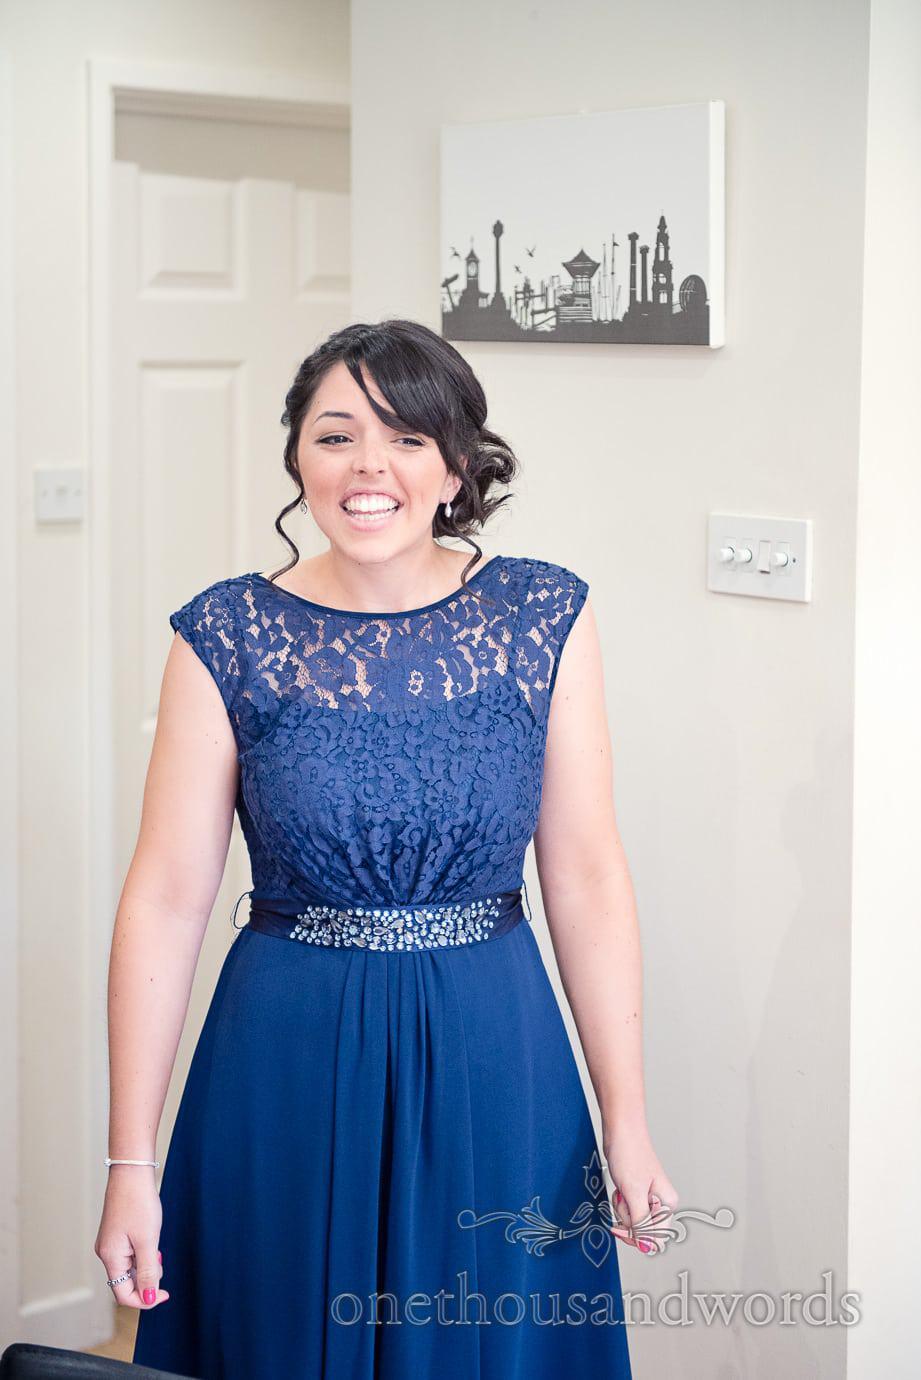 Bridesmaid in detailed blue bridesmaids dress on wedding morning